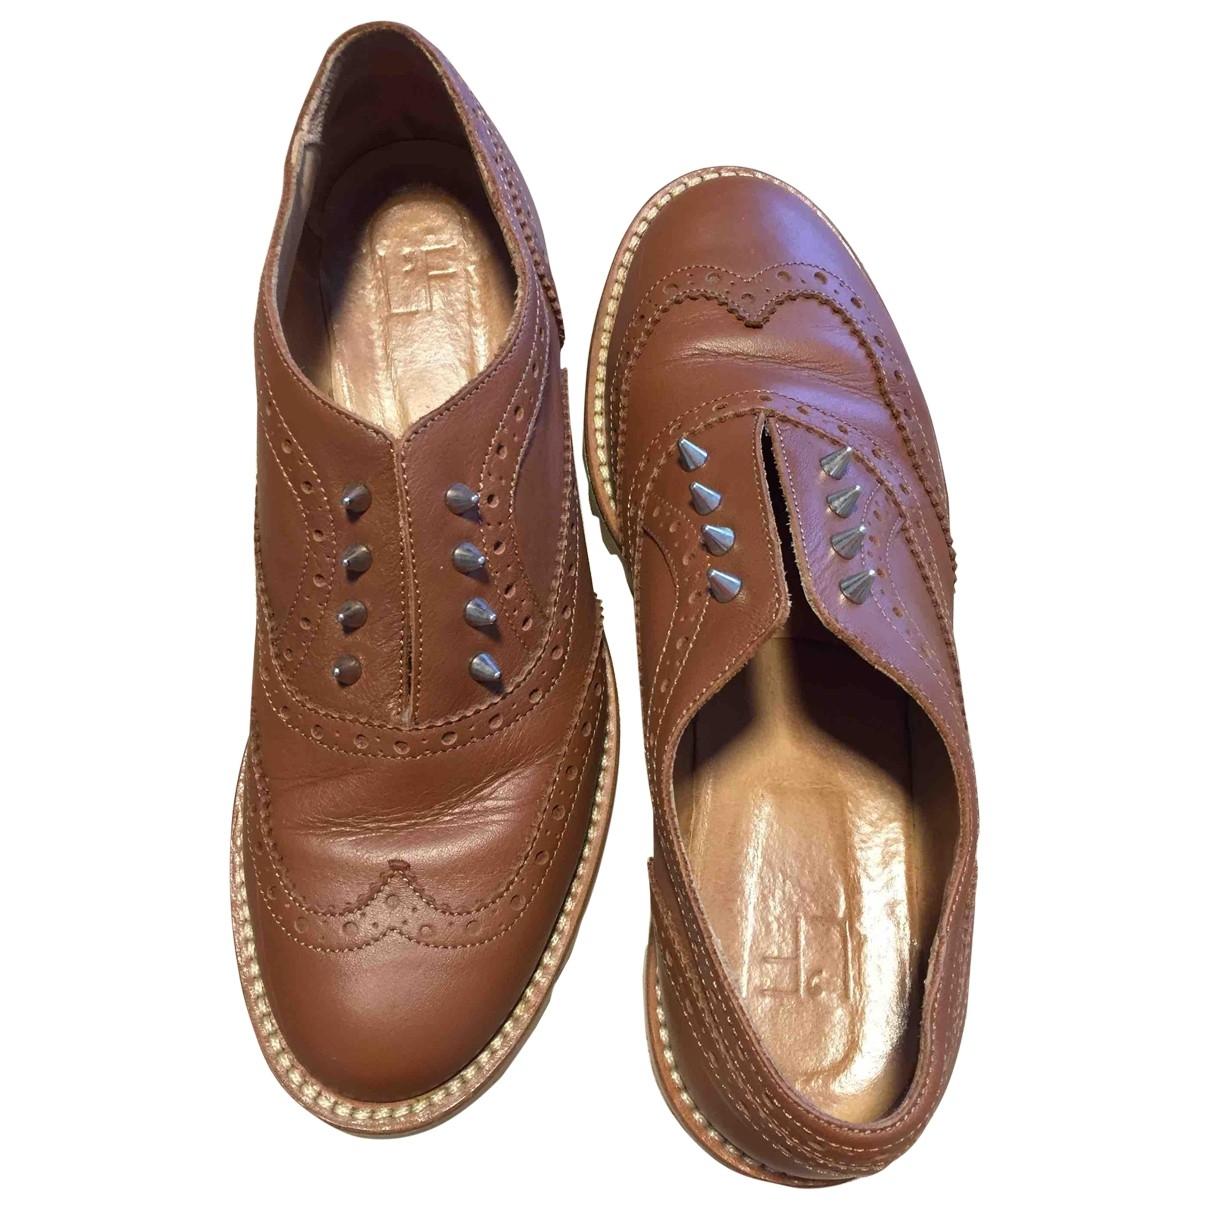 L'f Shoes \N Camel Leather Flats for Women 39 EU